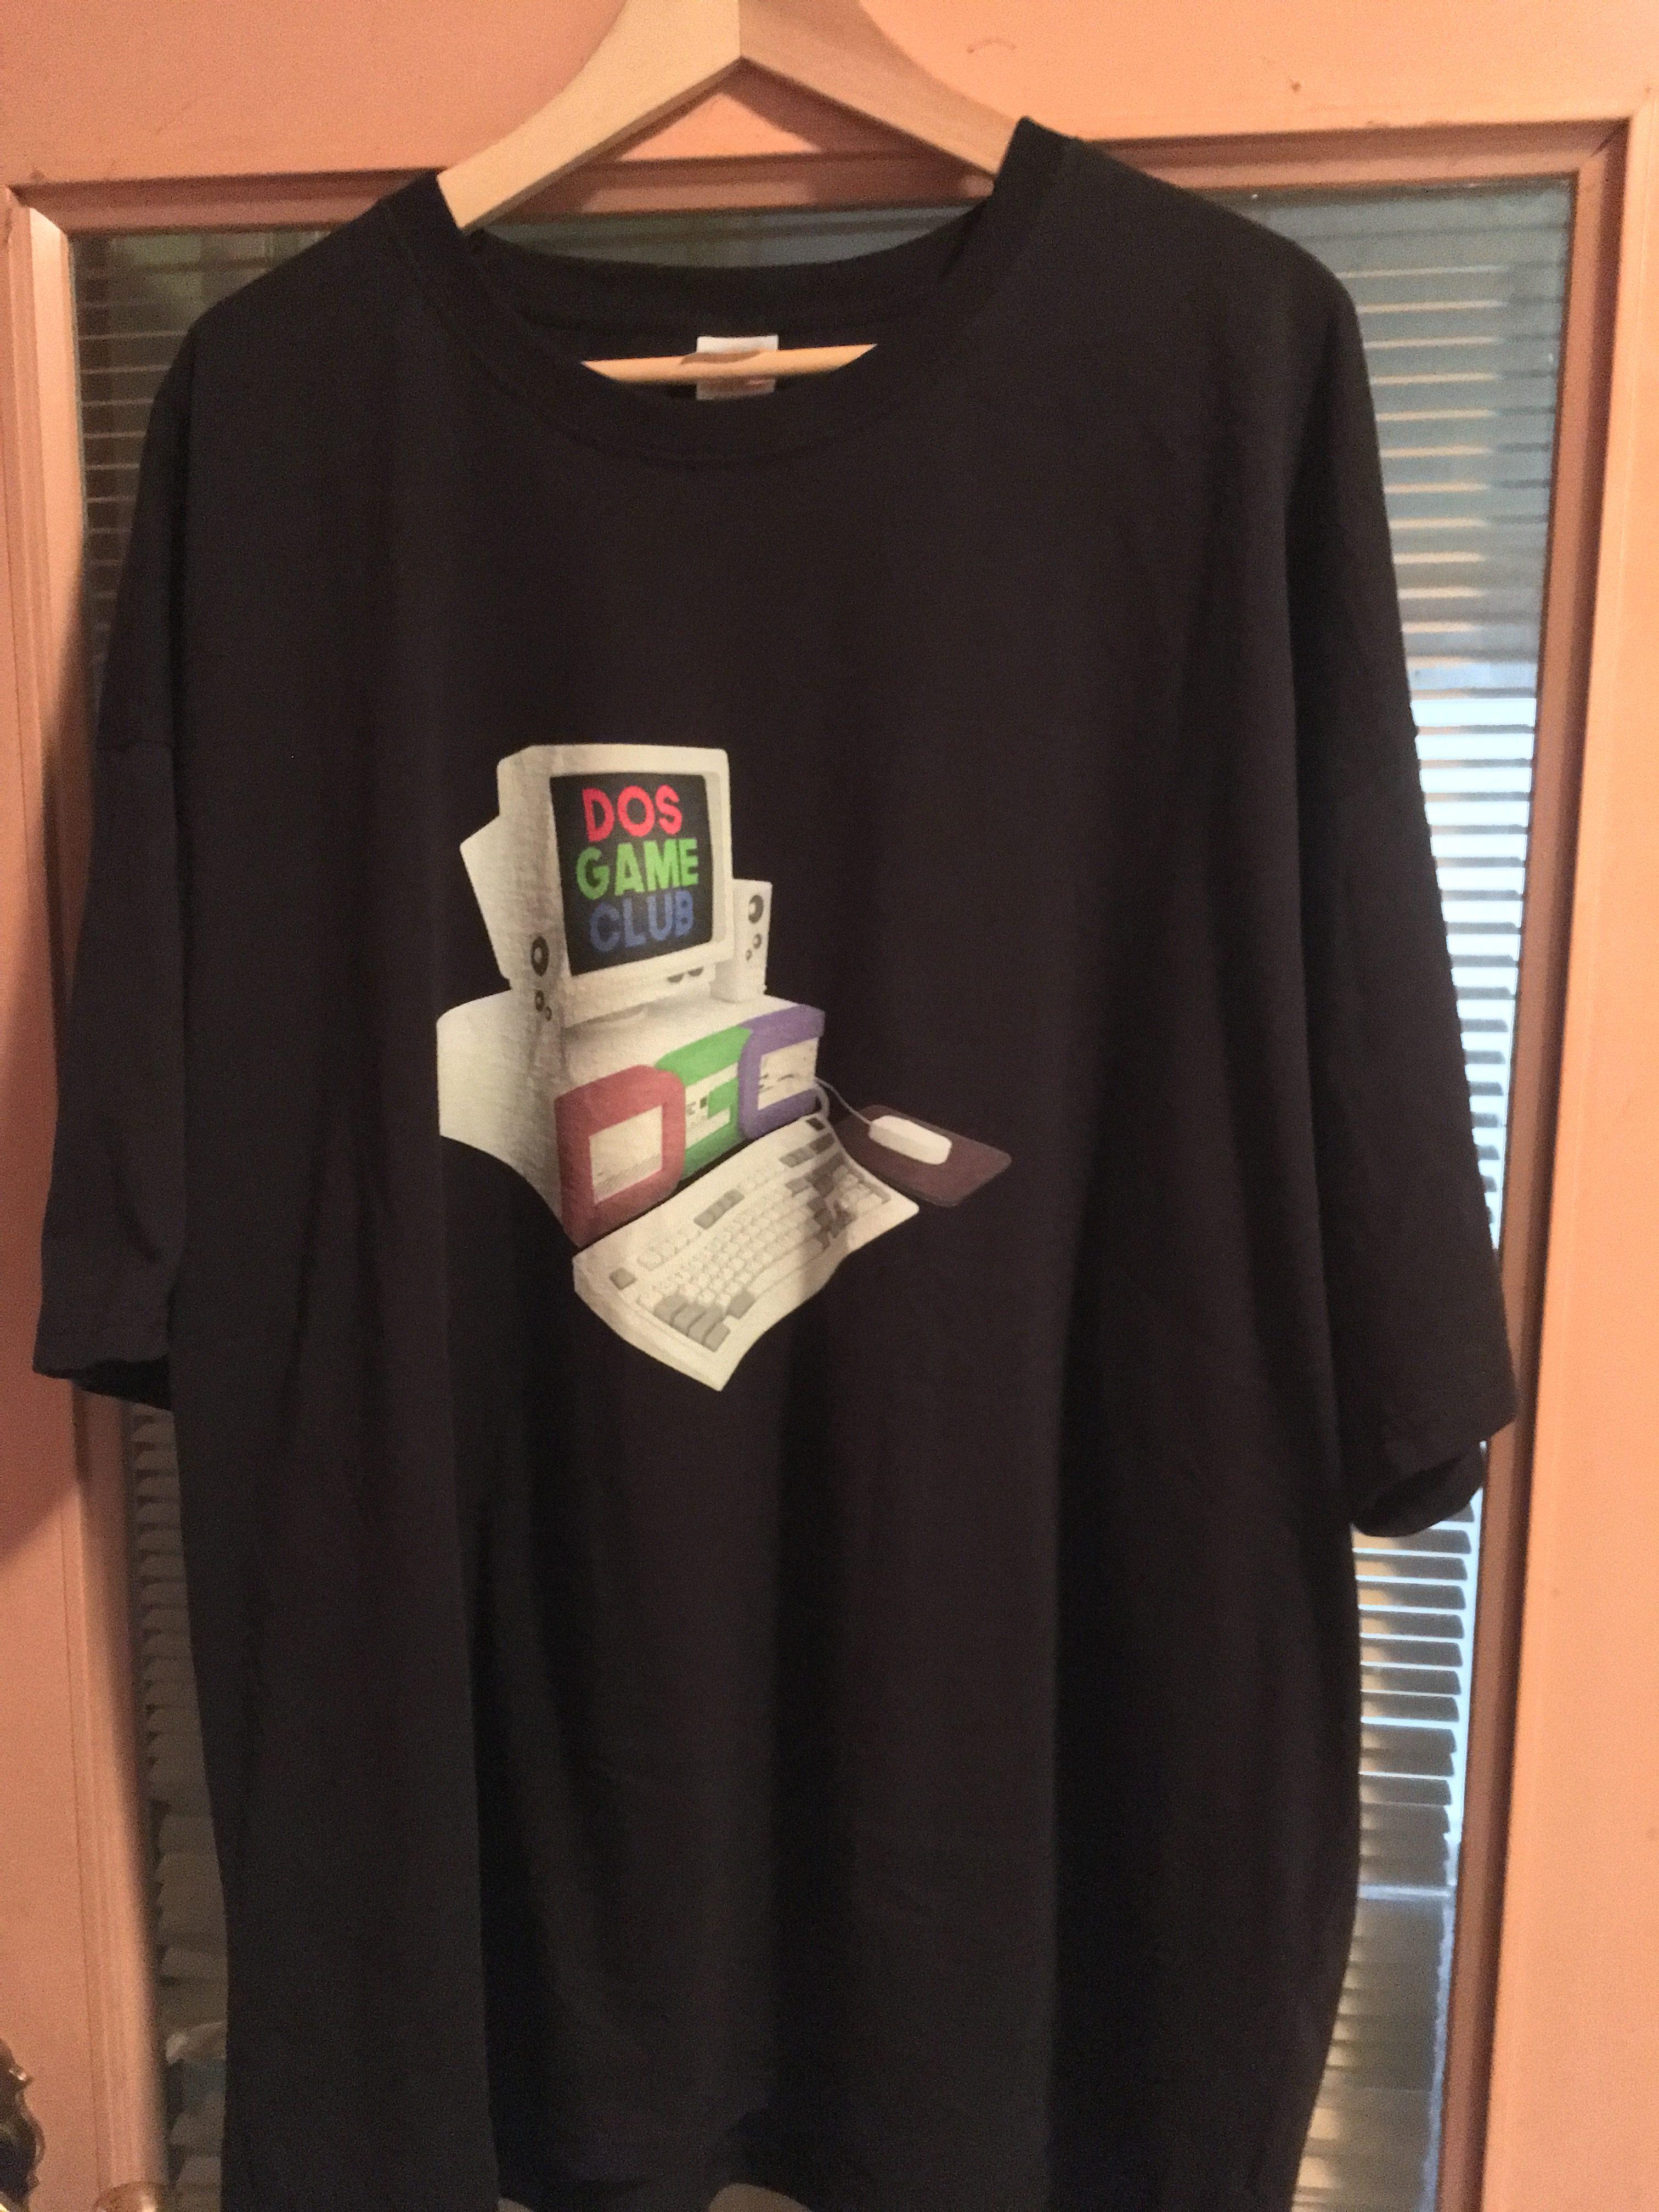 DOS Game Club T-shirt